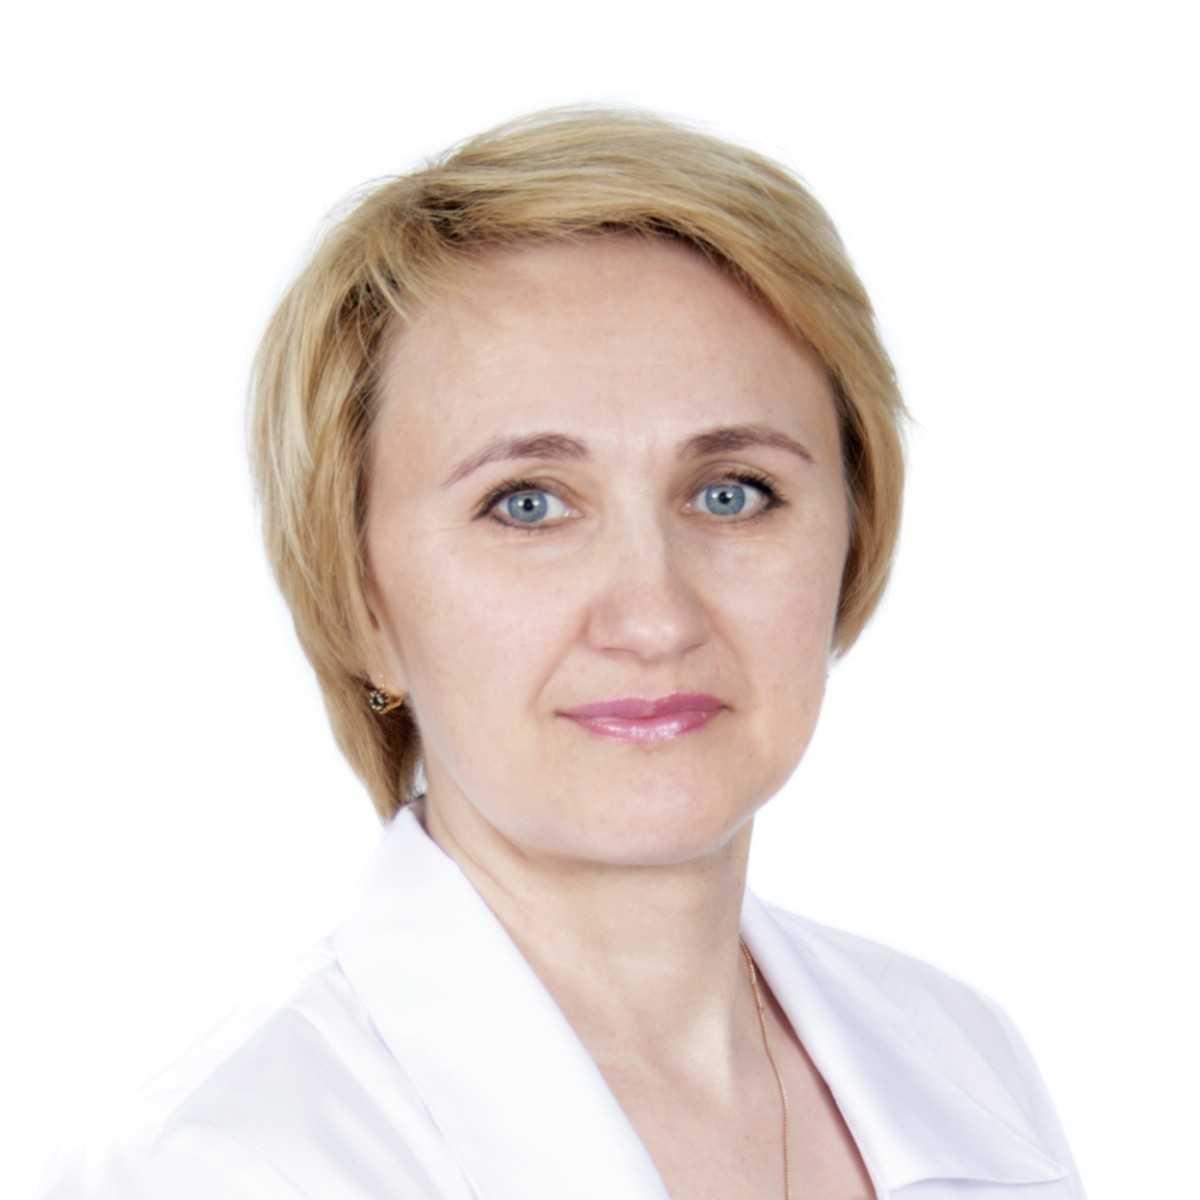 Дудина Ирина Юрьевна - фотография